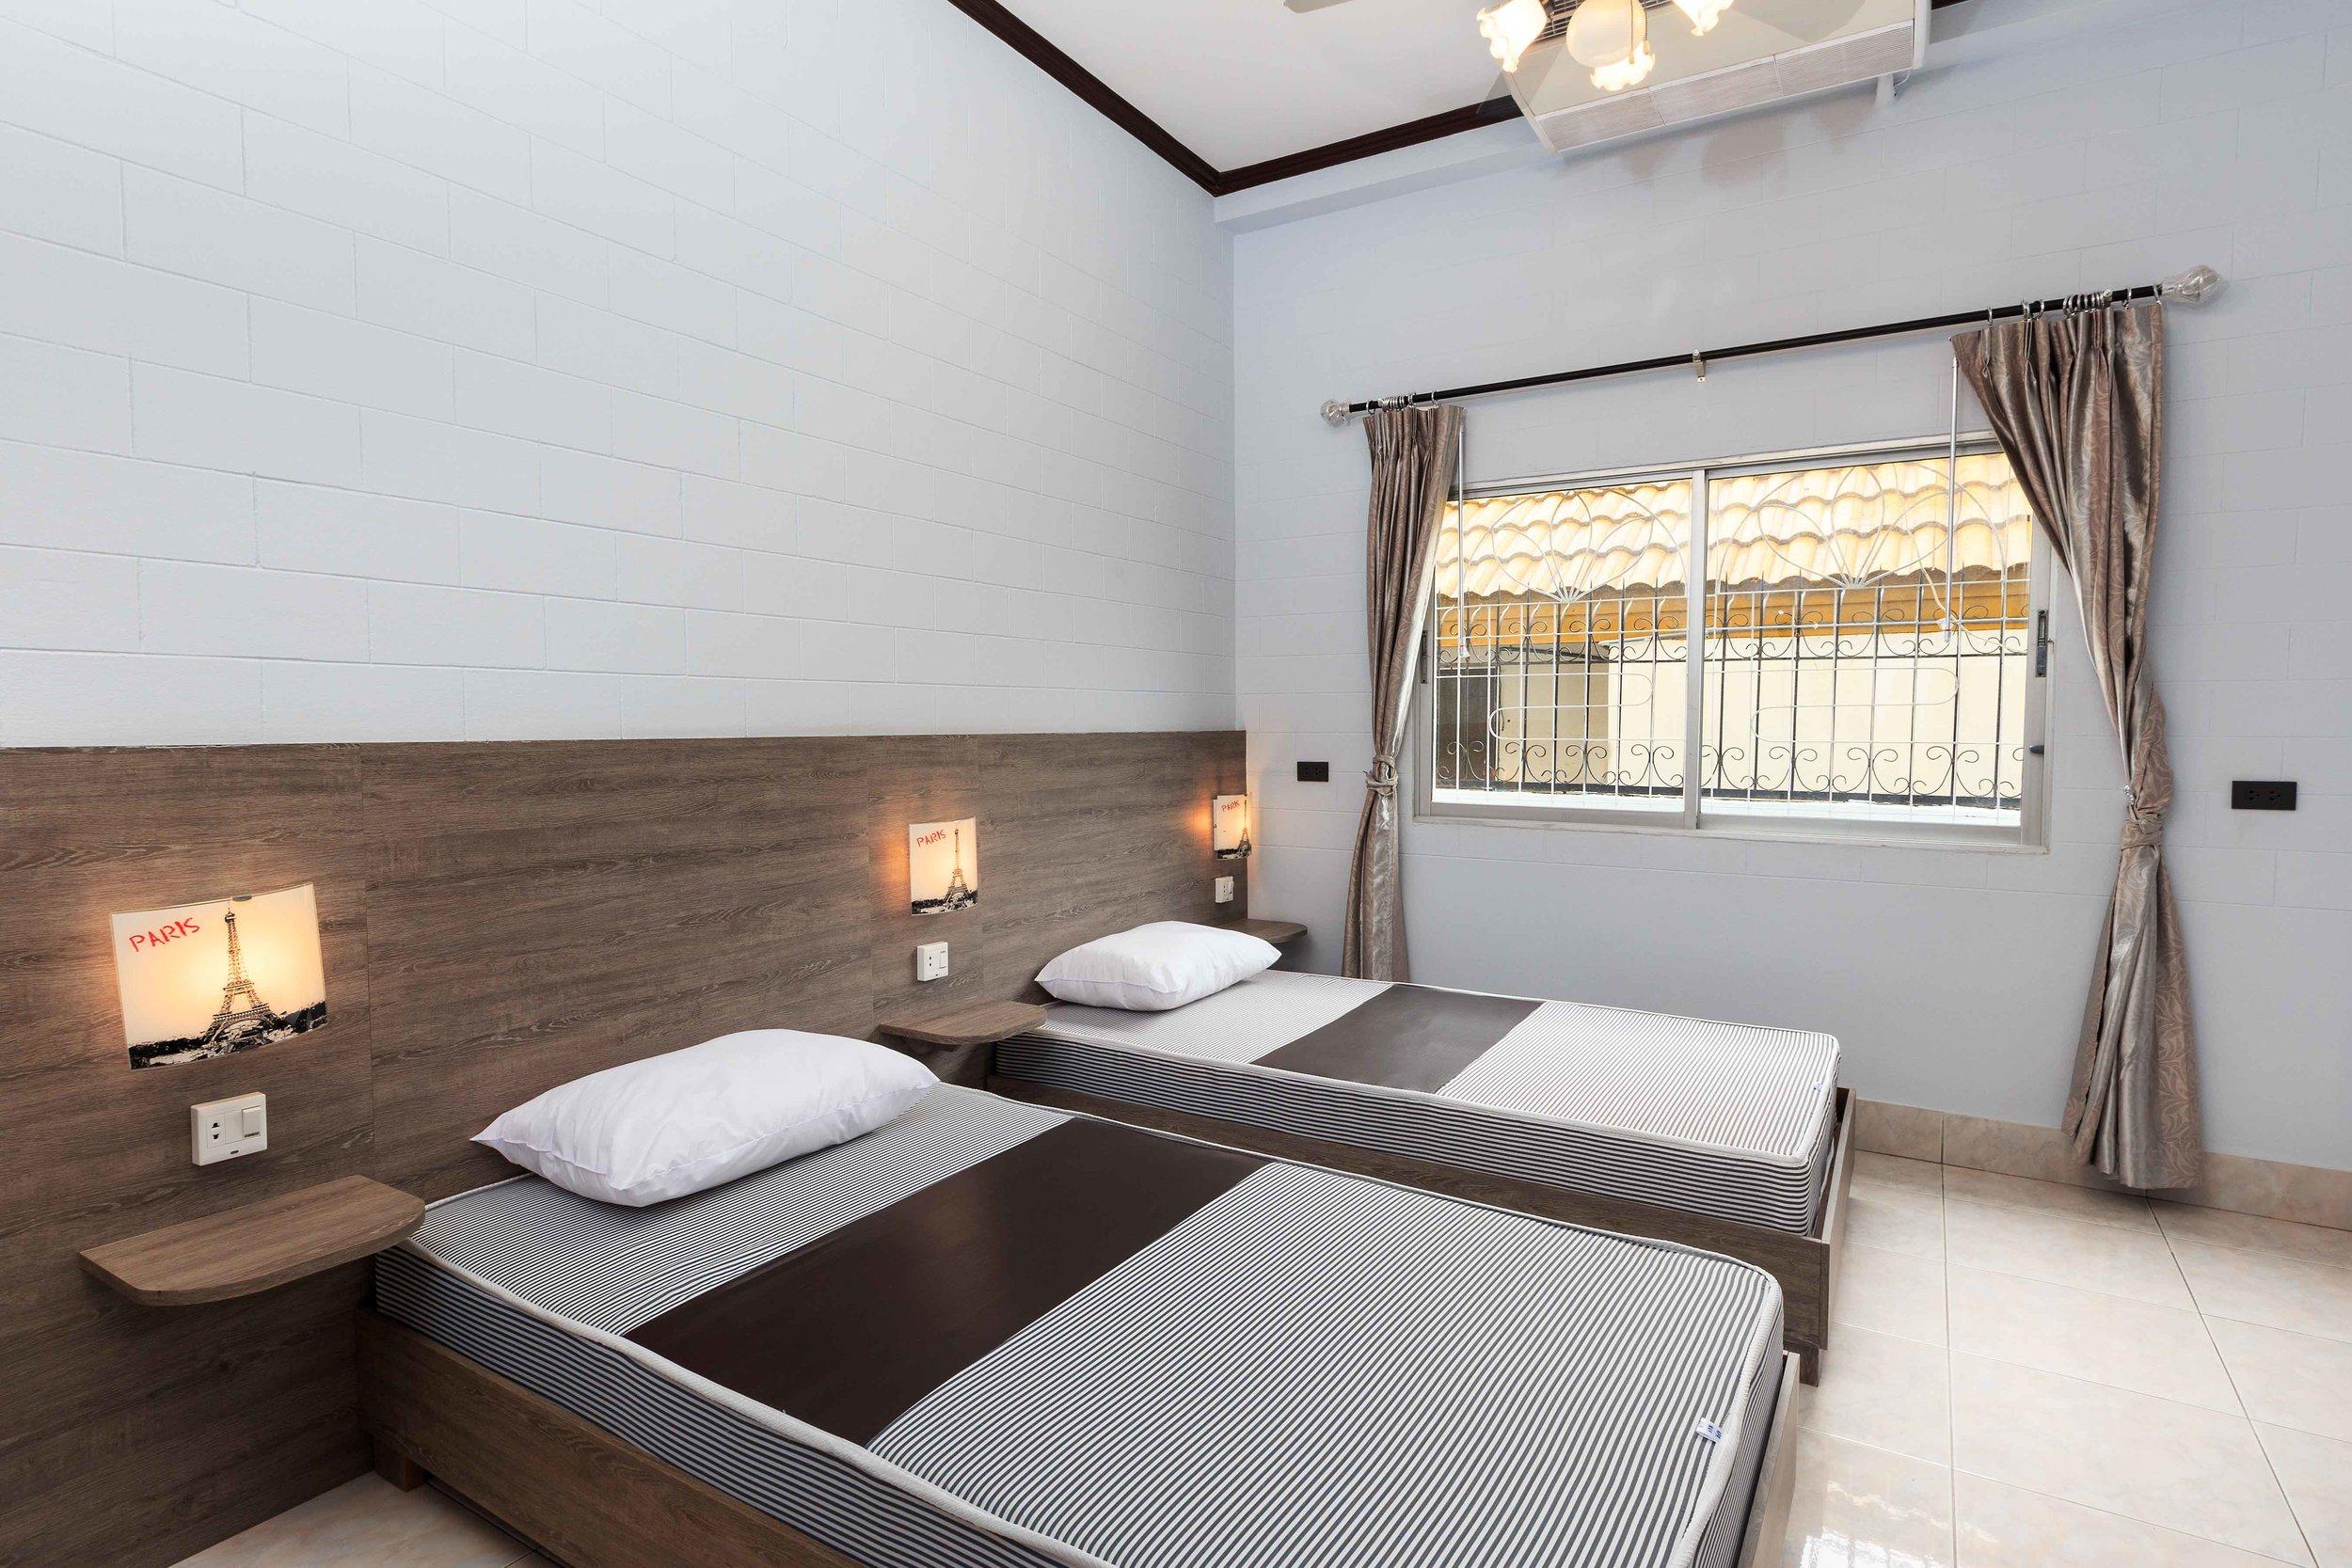 Room02-02.jpg